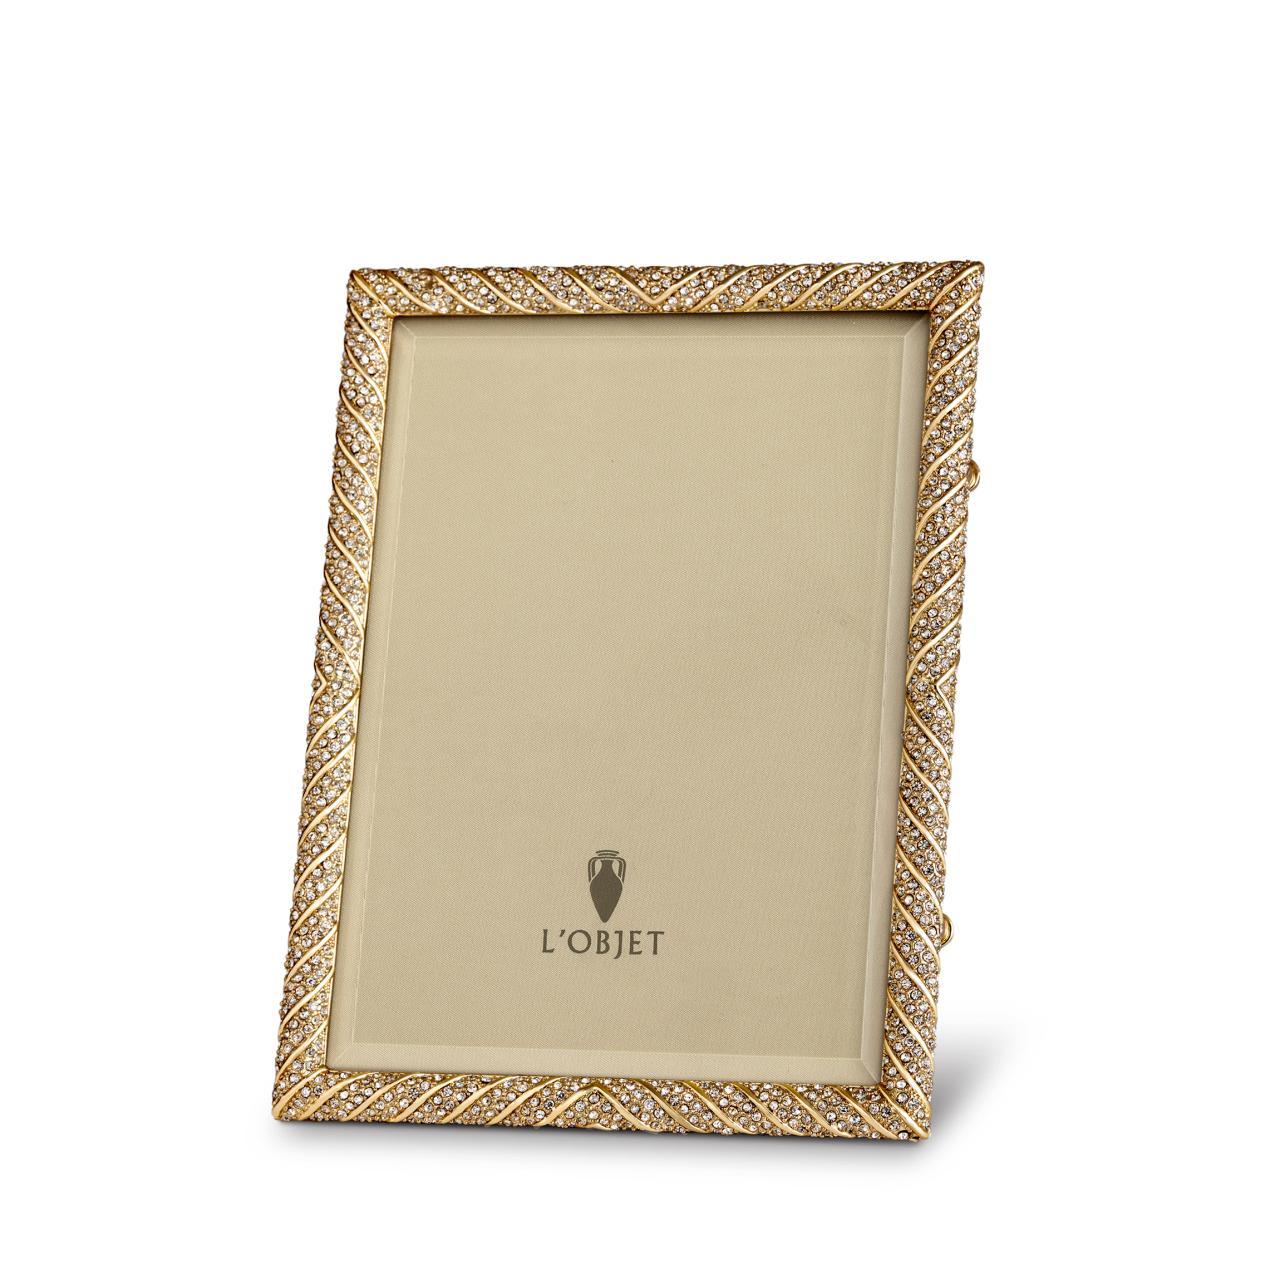 Deco twist frame 4x6 gold white crystals lobjet